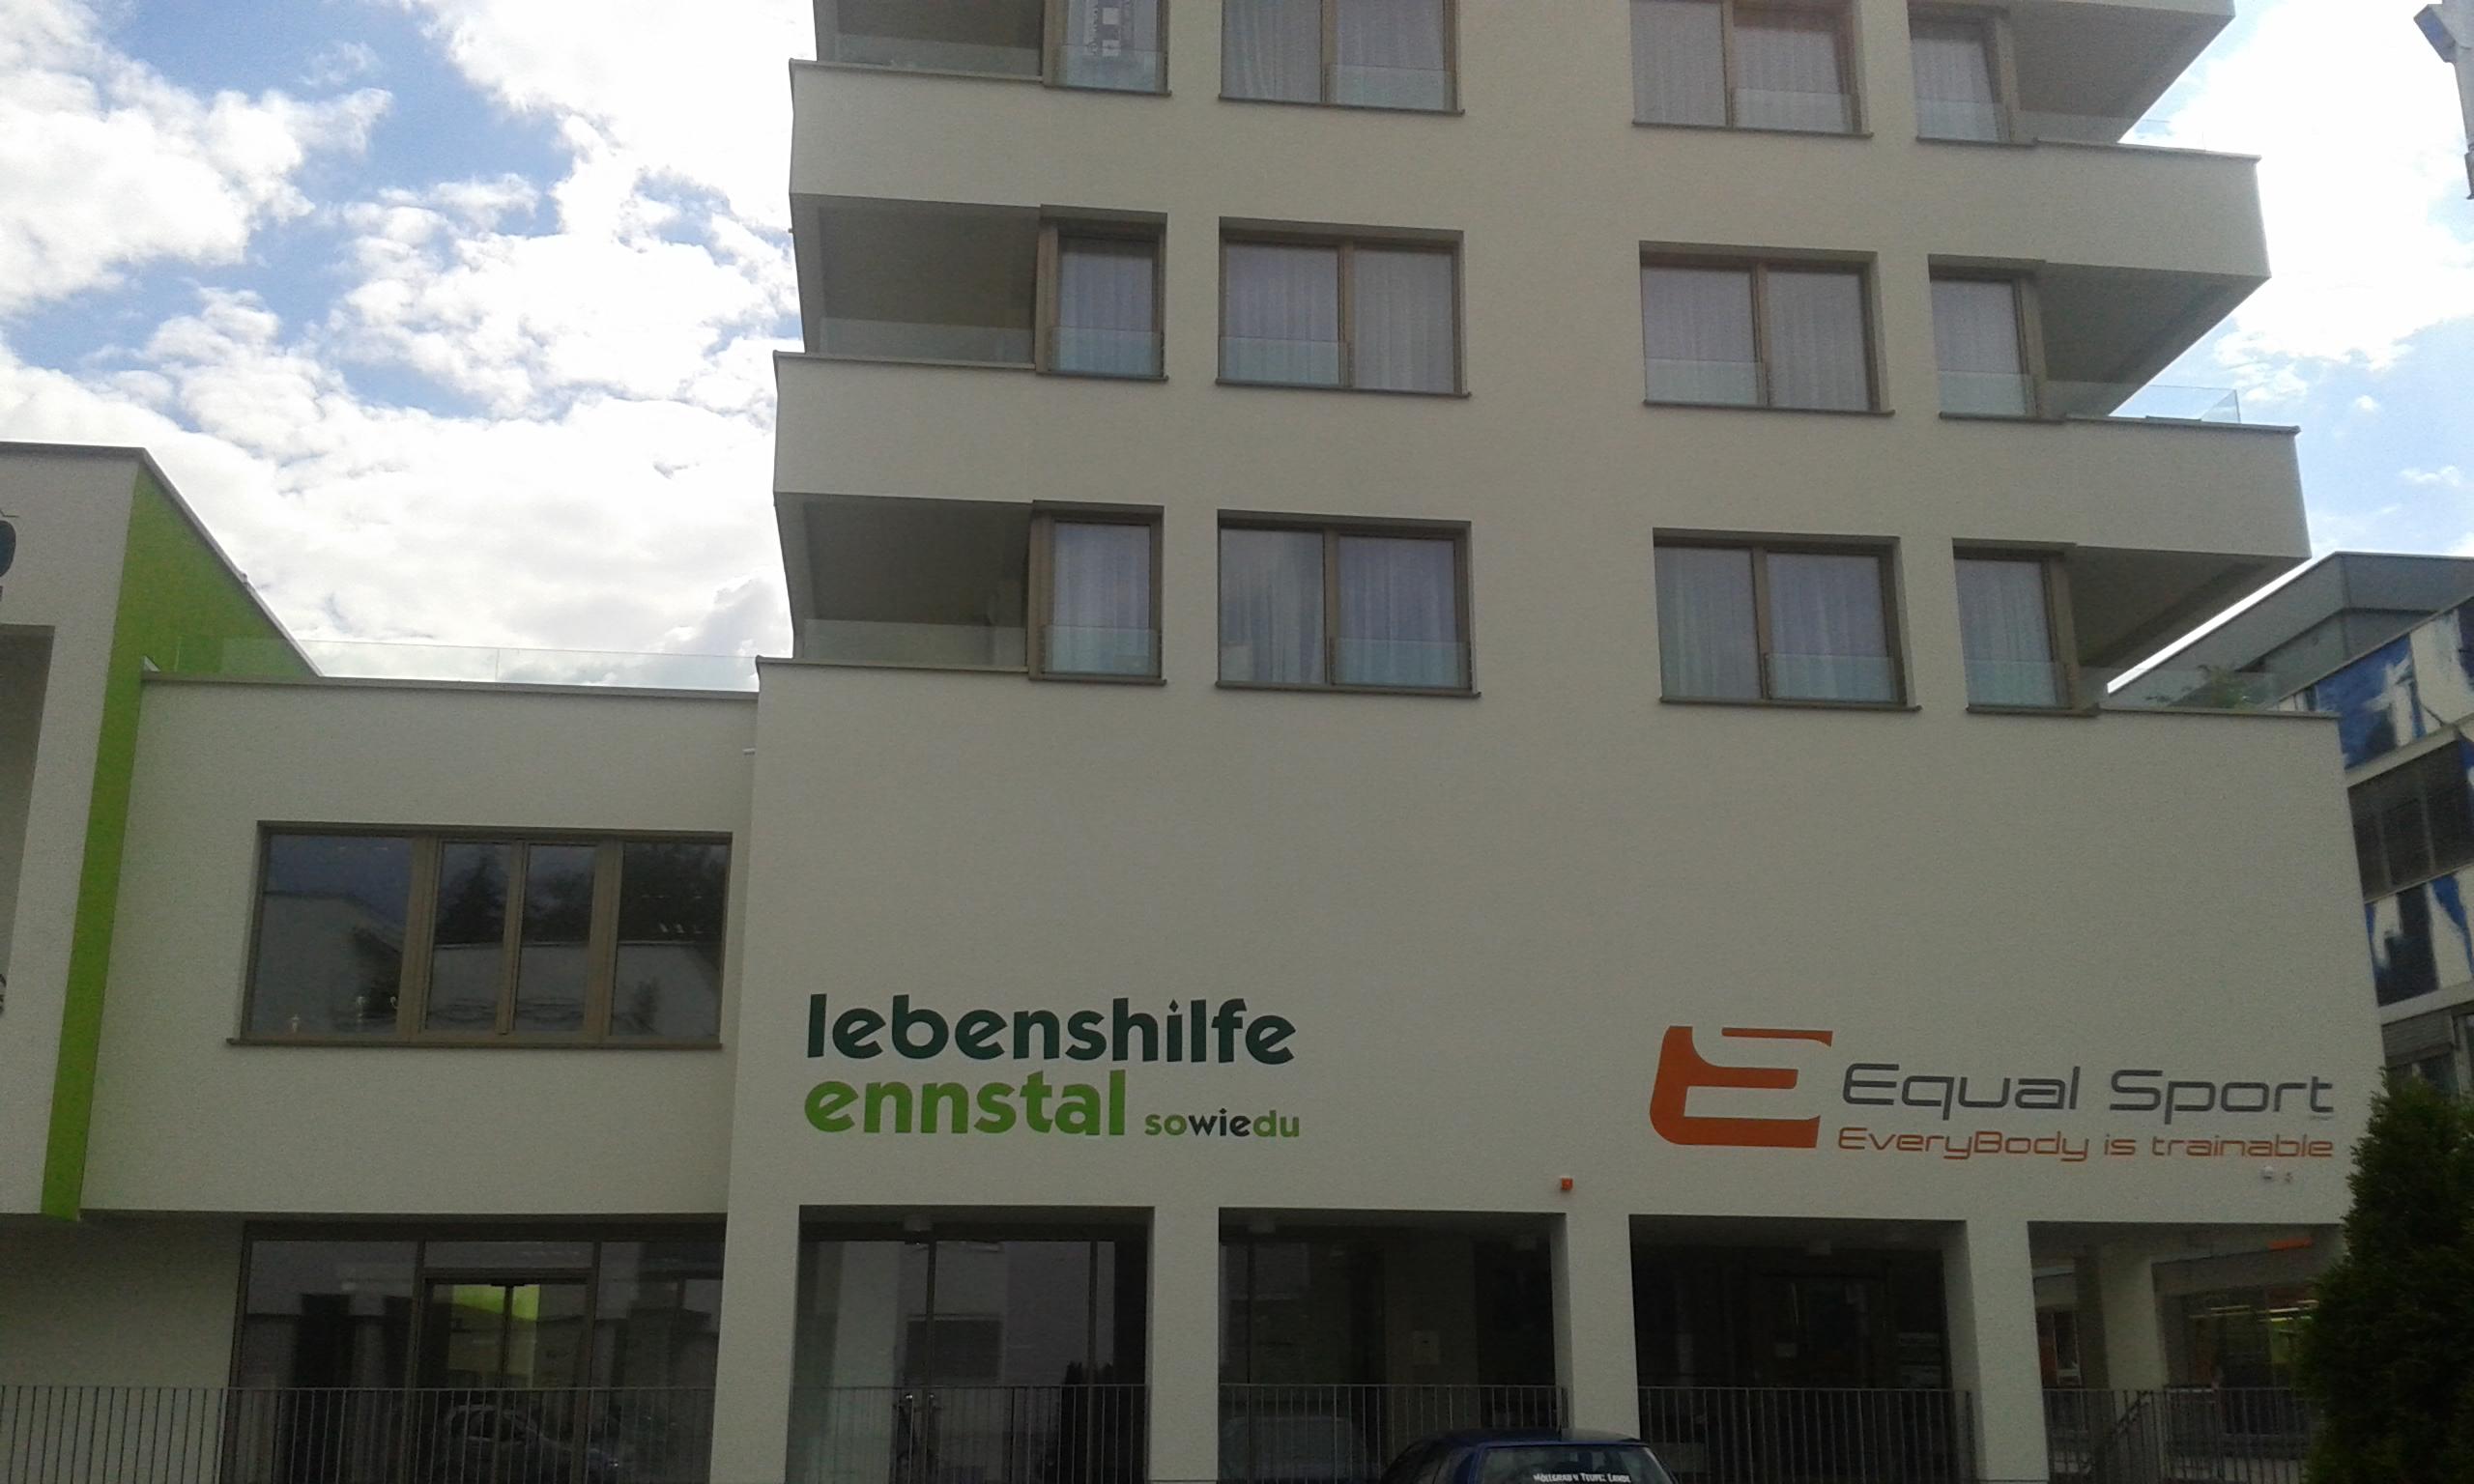 Lebenshilfe Ennstal Trainingswohnen, Fronleichnamsweg 13, 8940, Austria